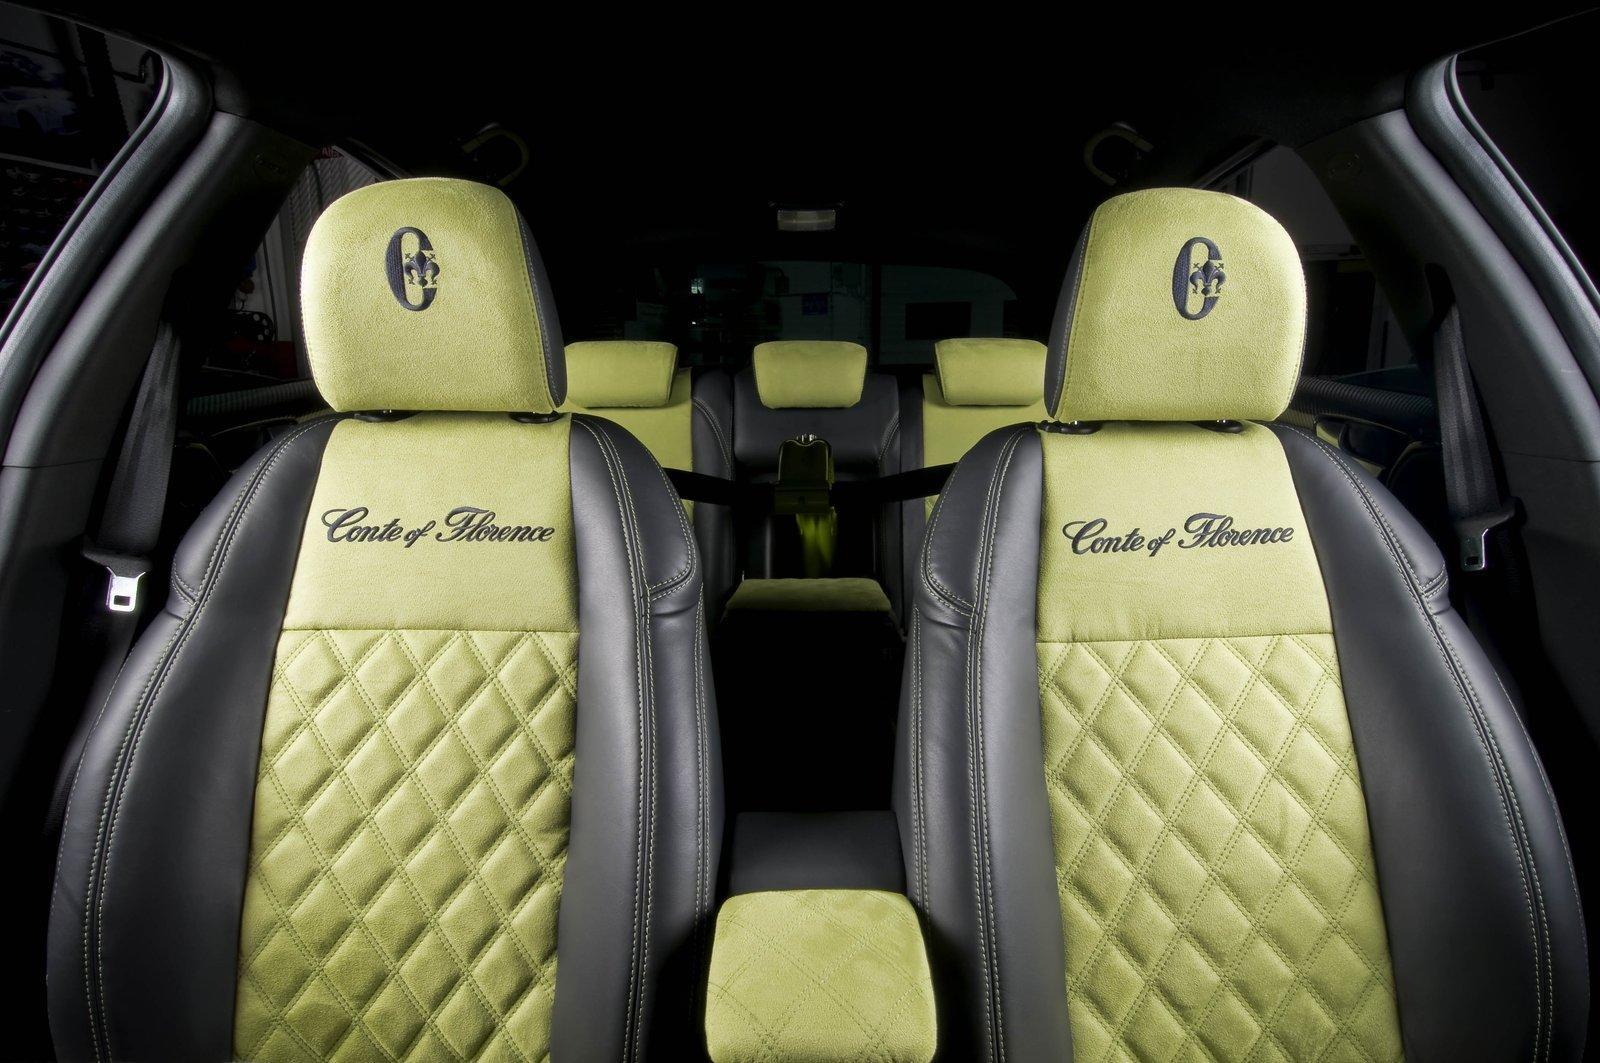 2010 maragoni trc italia alfa rom o giulietta g430 imove dark cars wallpapers. Black Bedroom Furniture Sets. Home Design Ideas